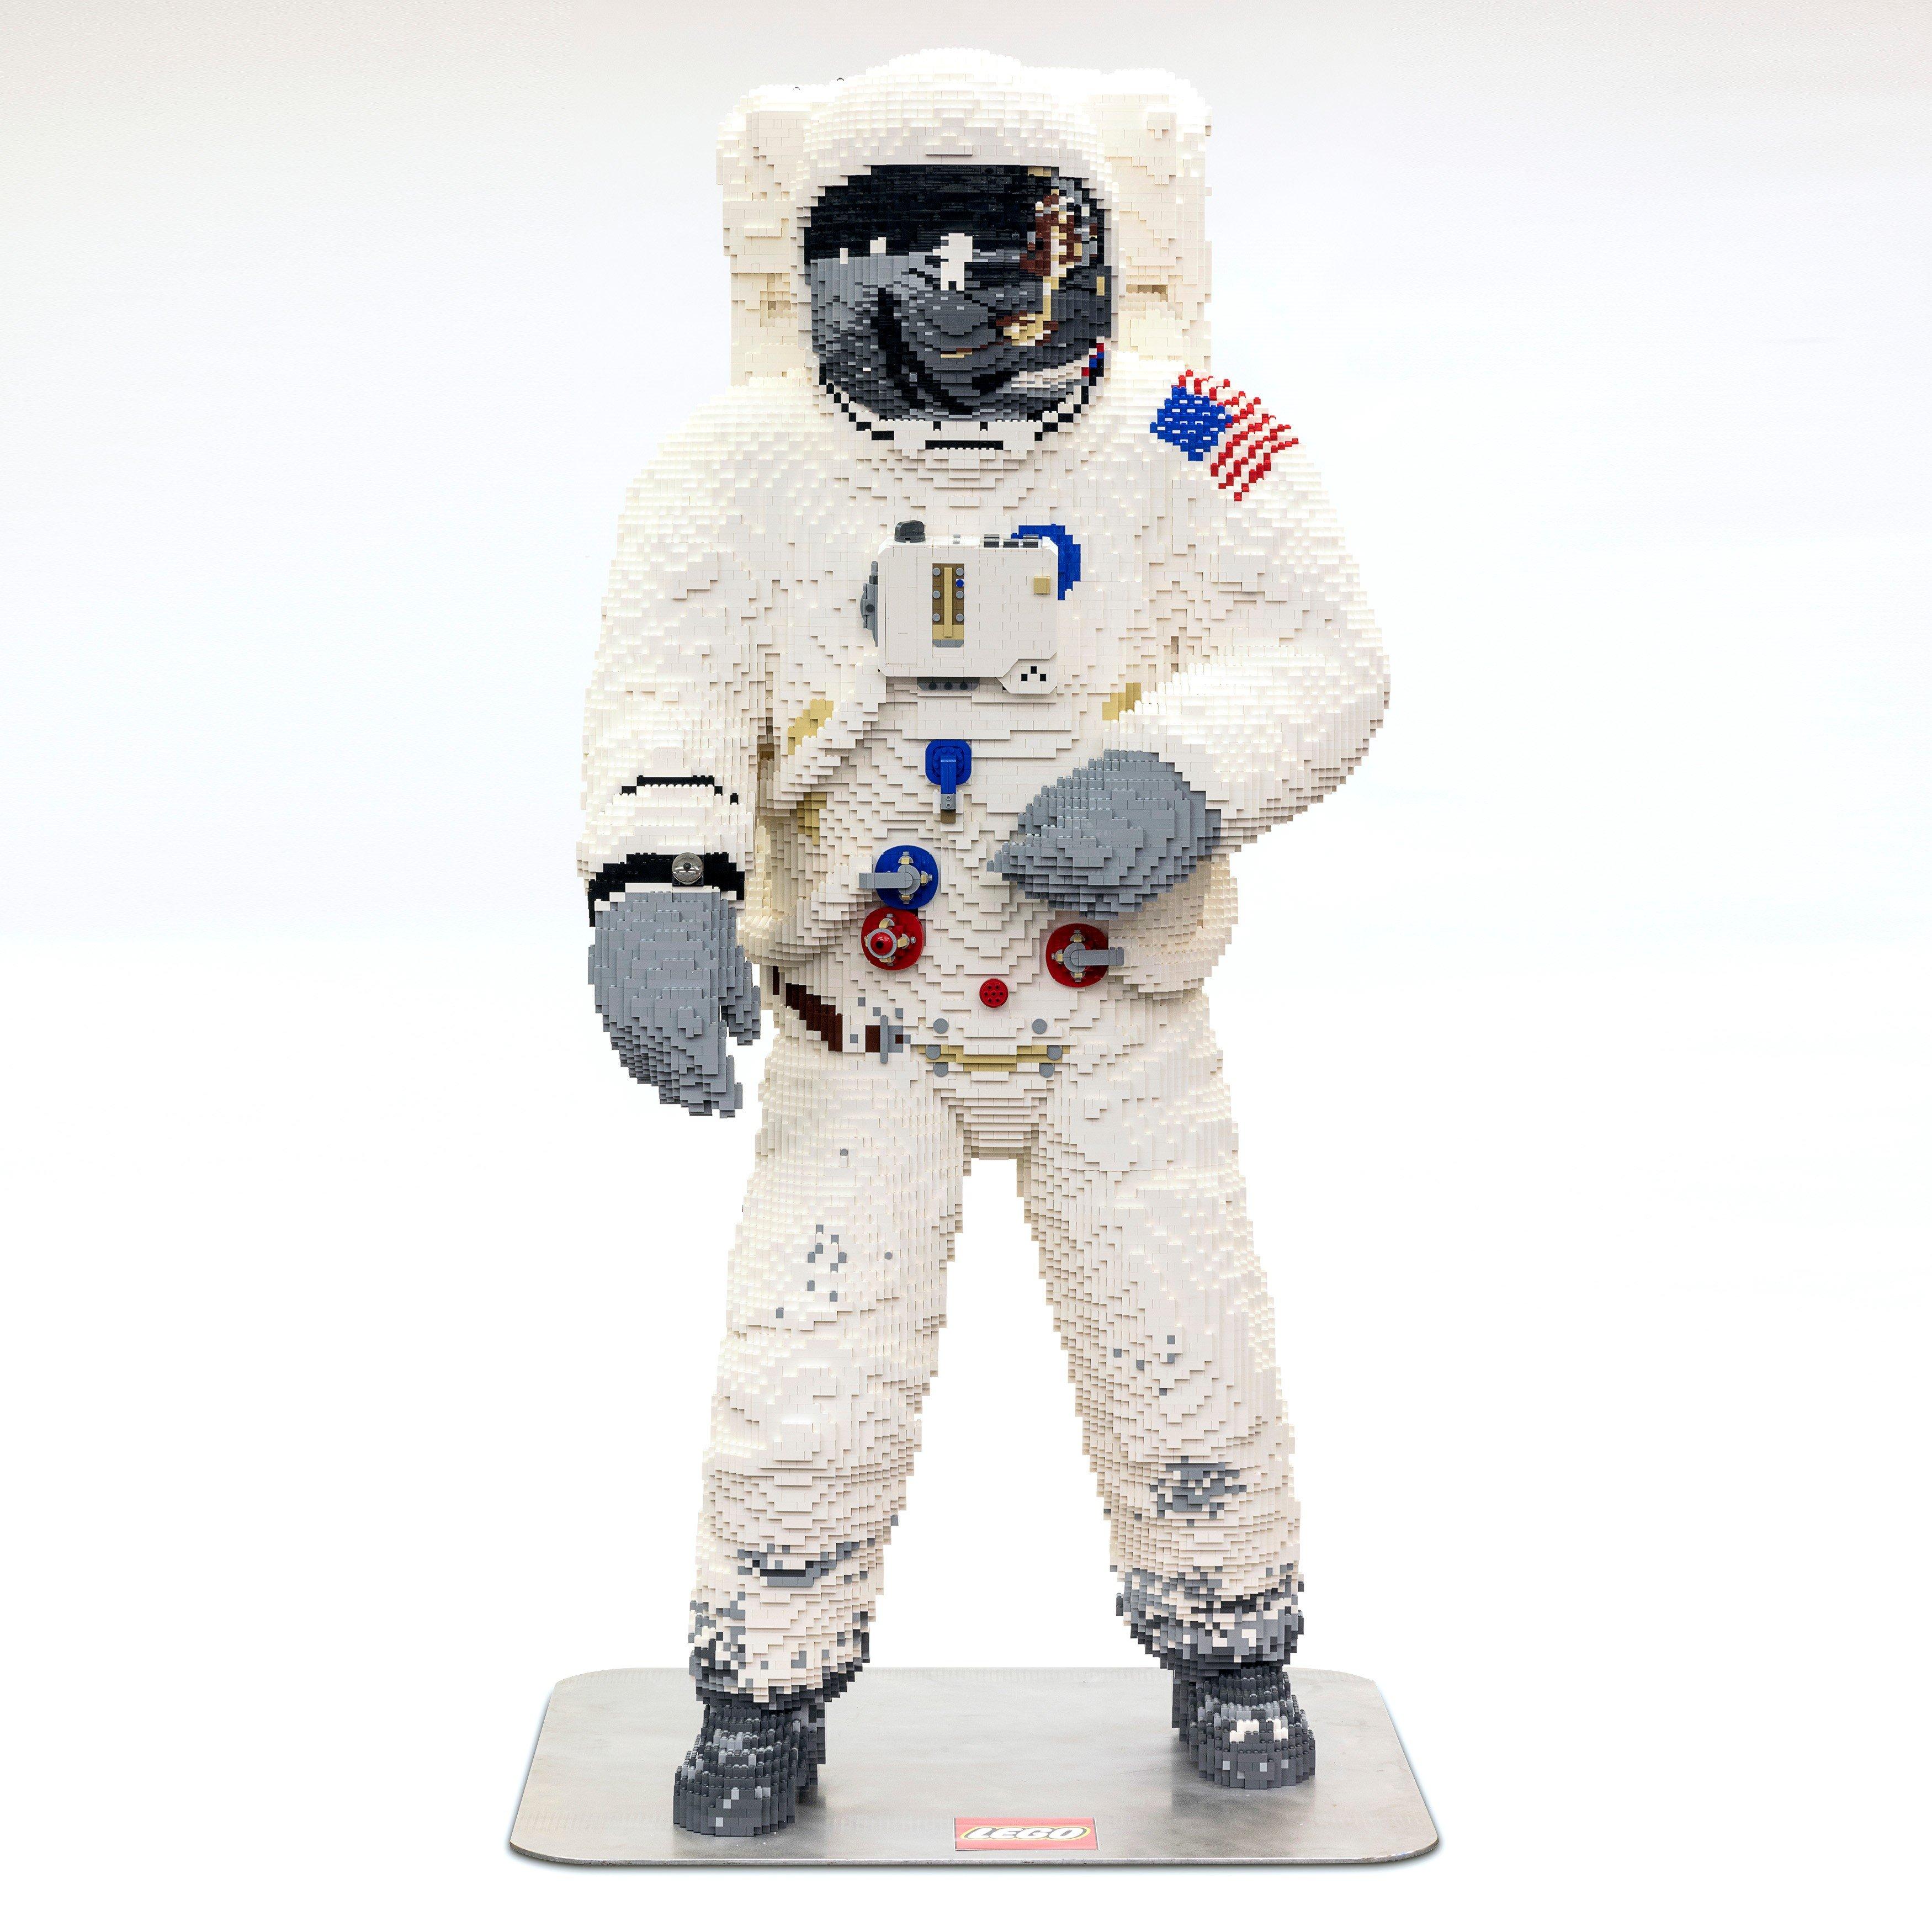 LEGO Astronaut Life Sized Model